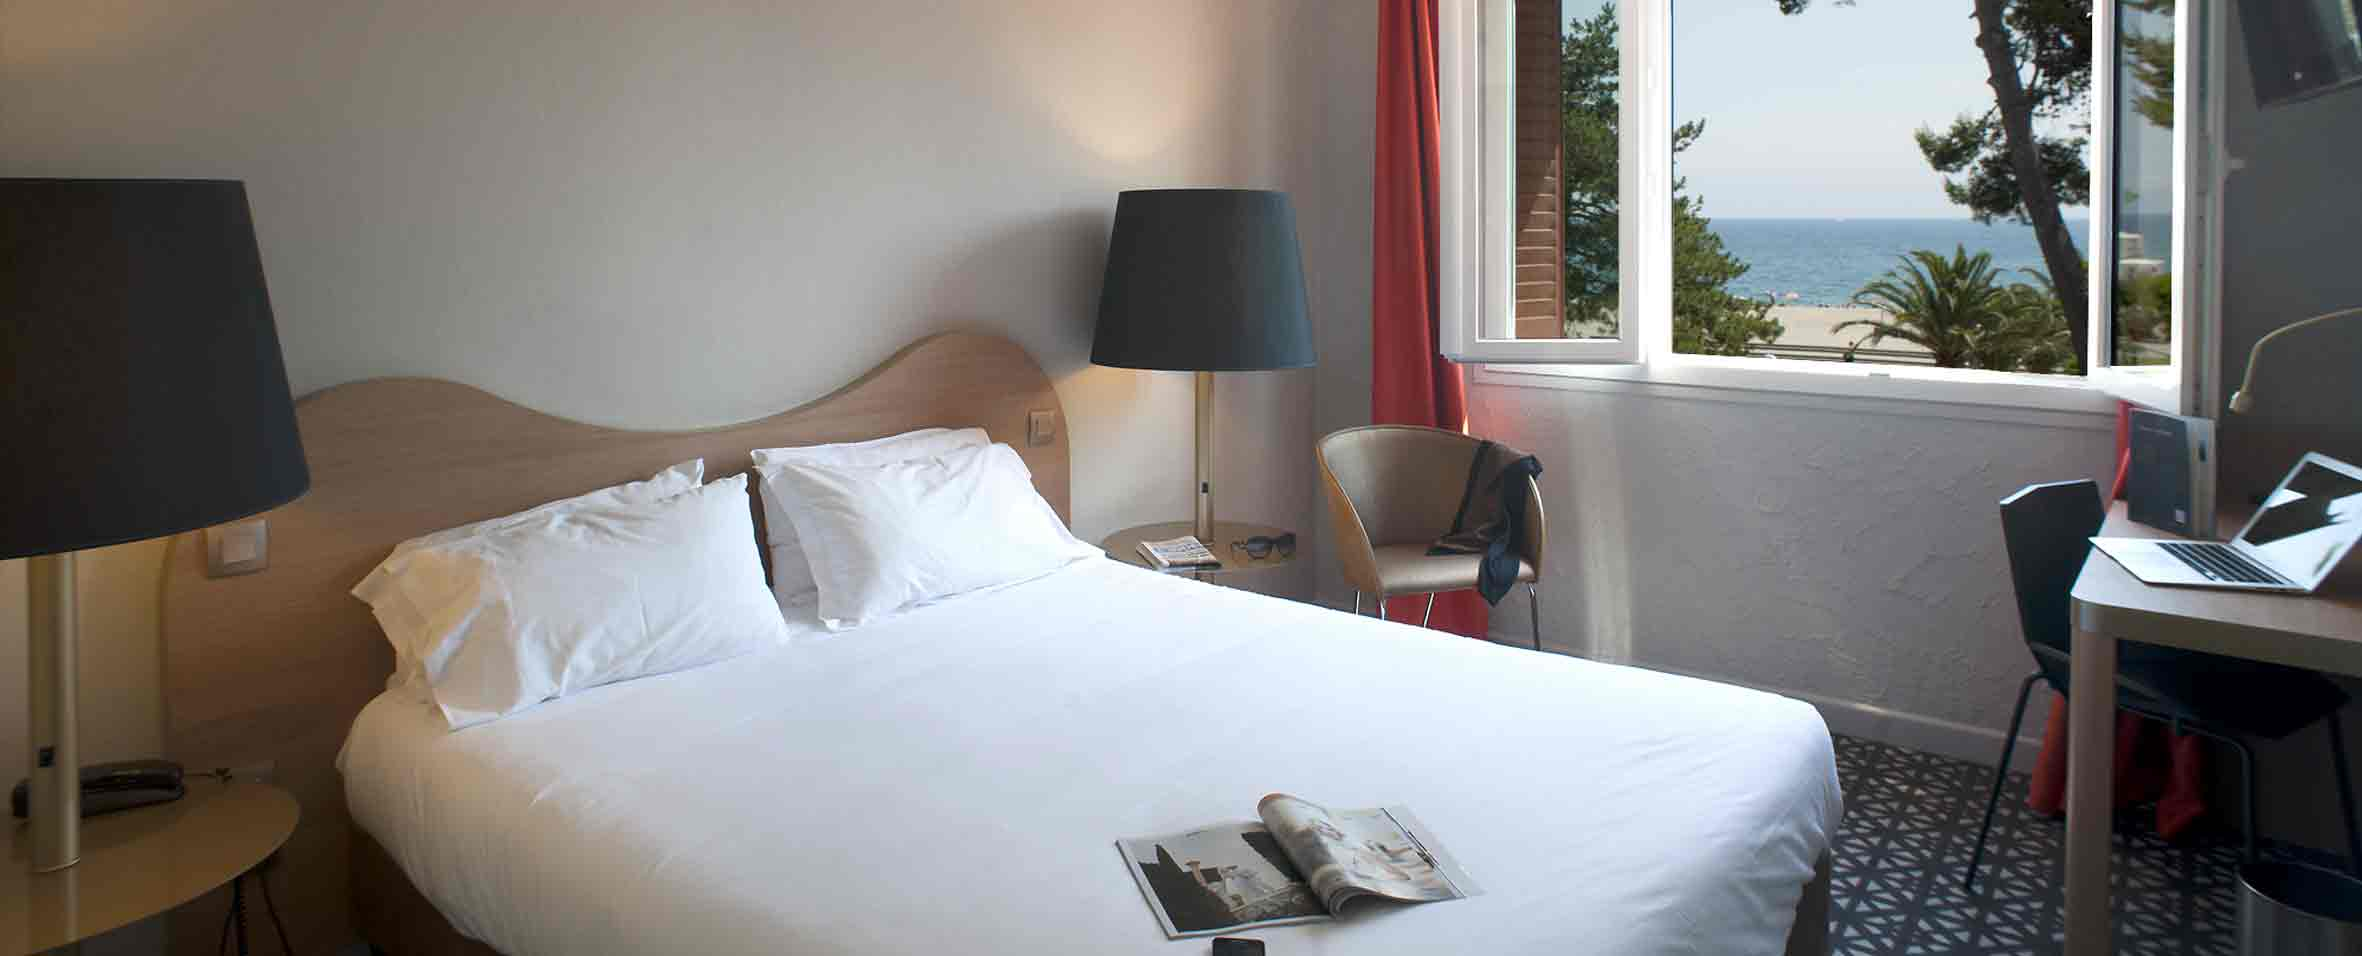 H´tel Beau Rivage Argel¨s sur Mer Charming hotel